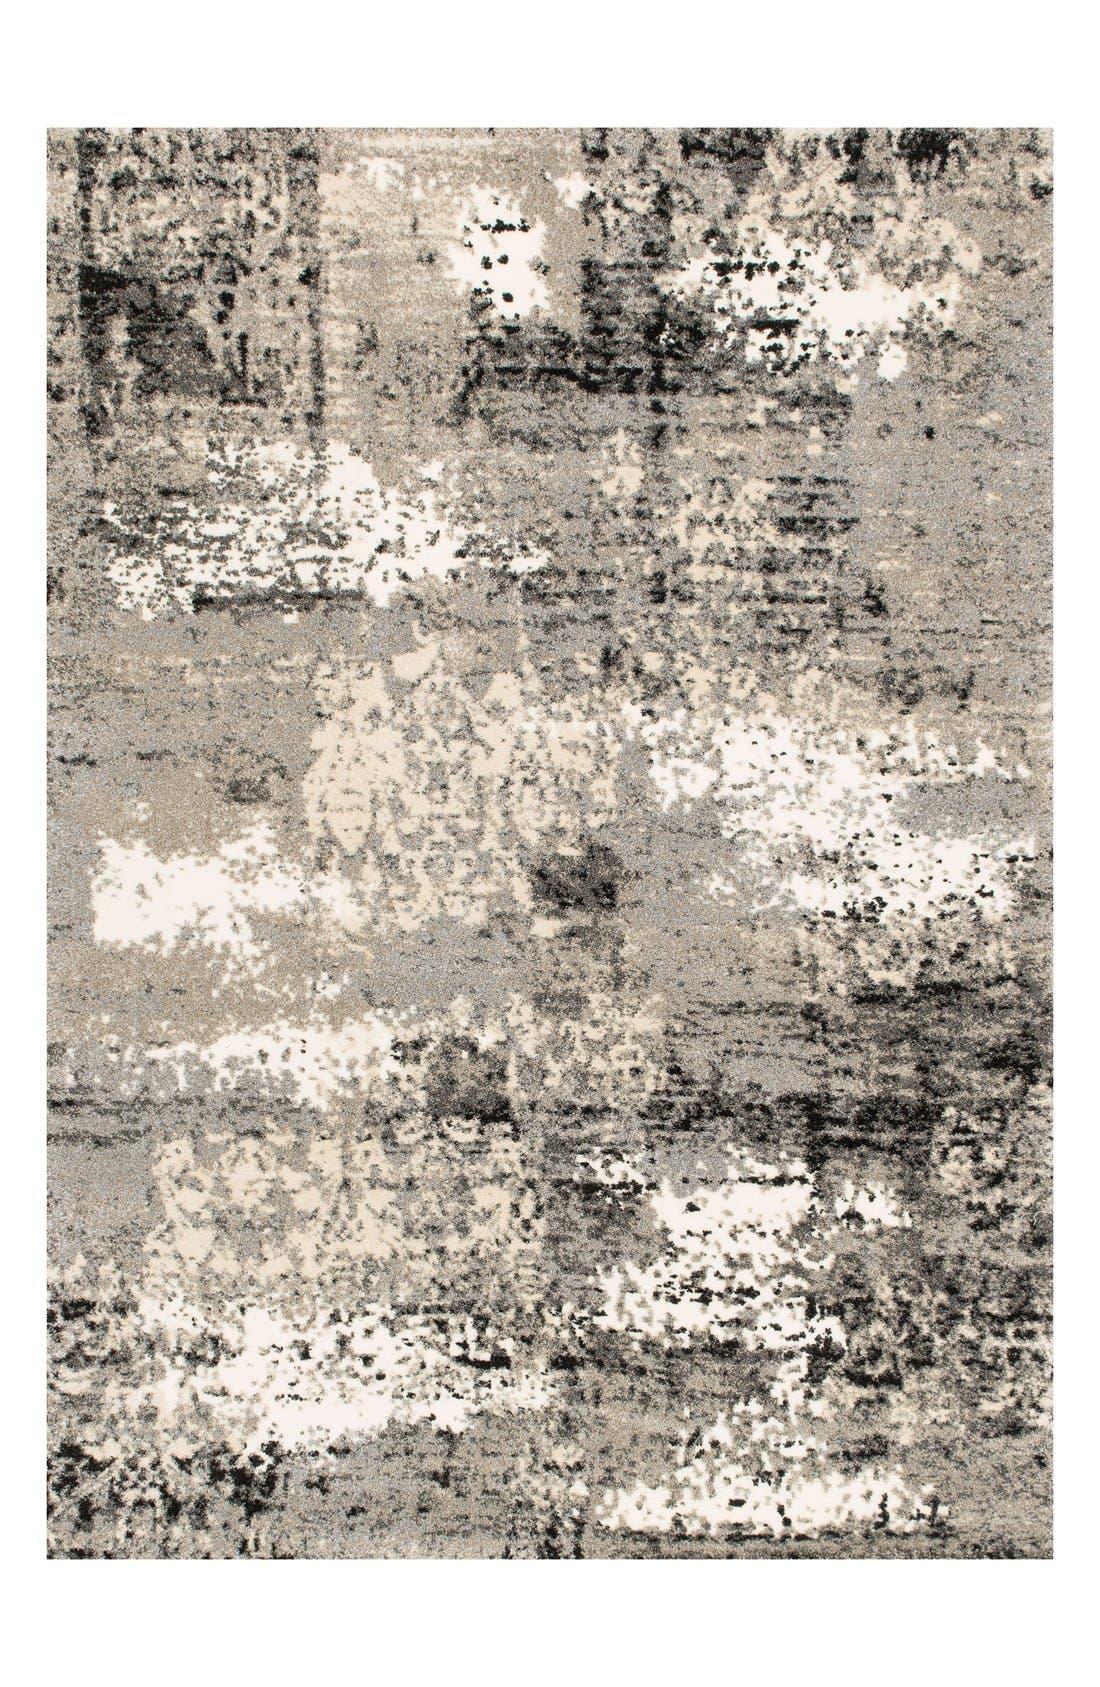 Alternate Image 1 Selected - Loloi'Viera' Area Rug